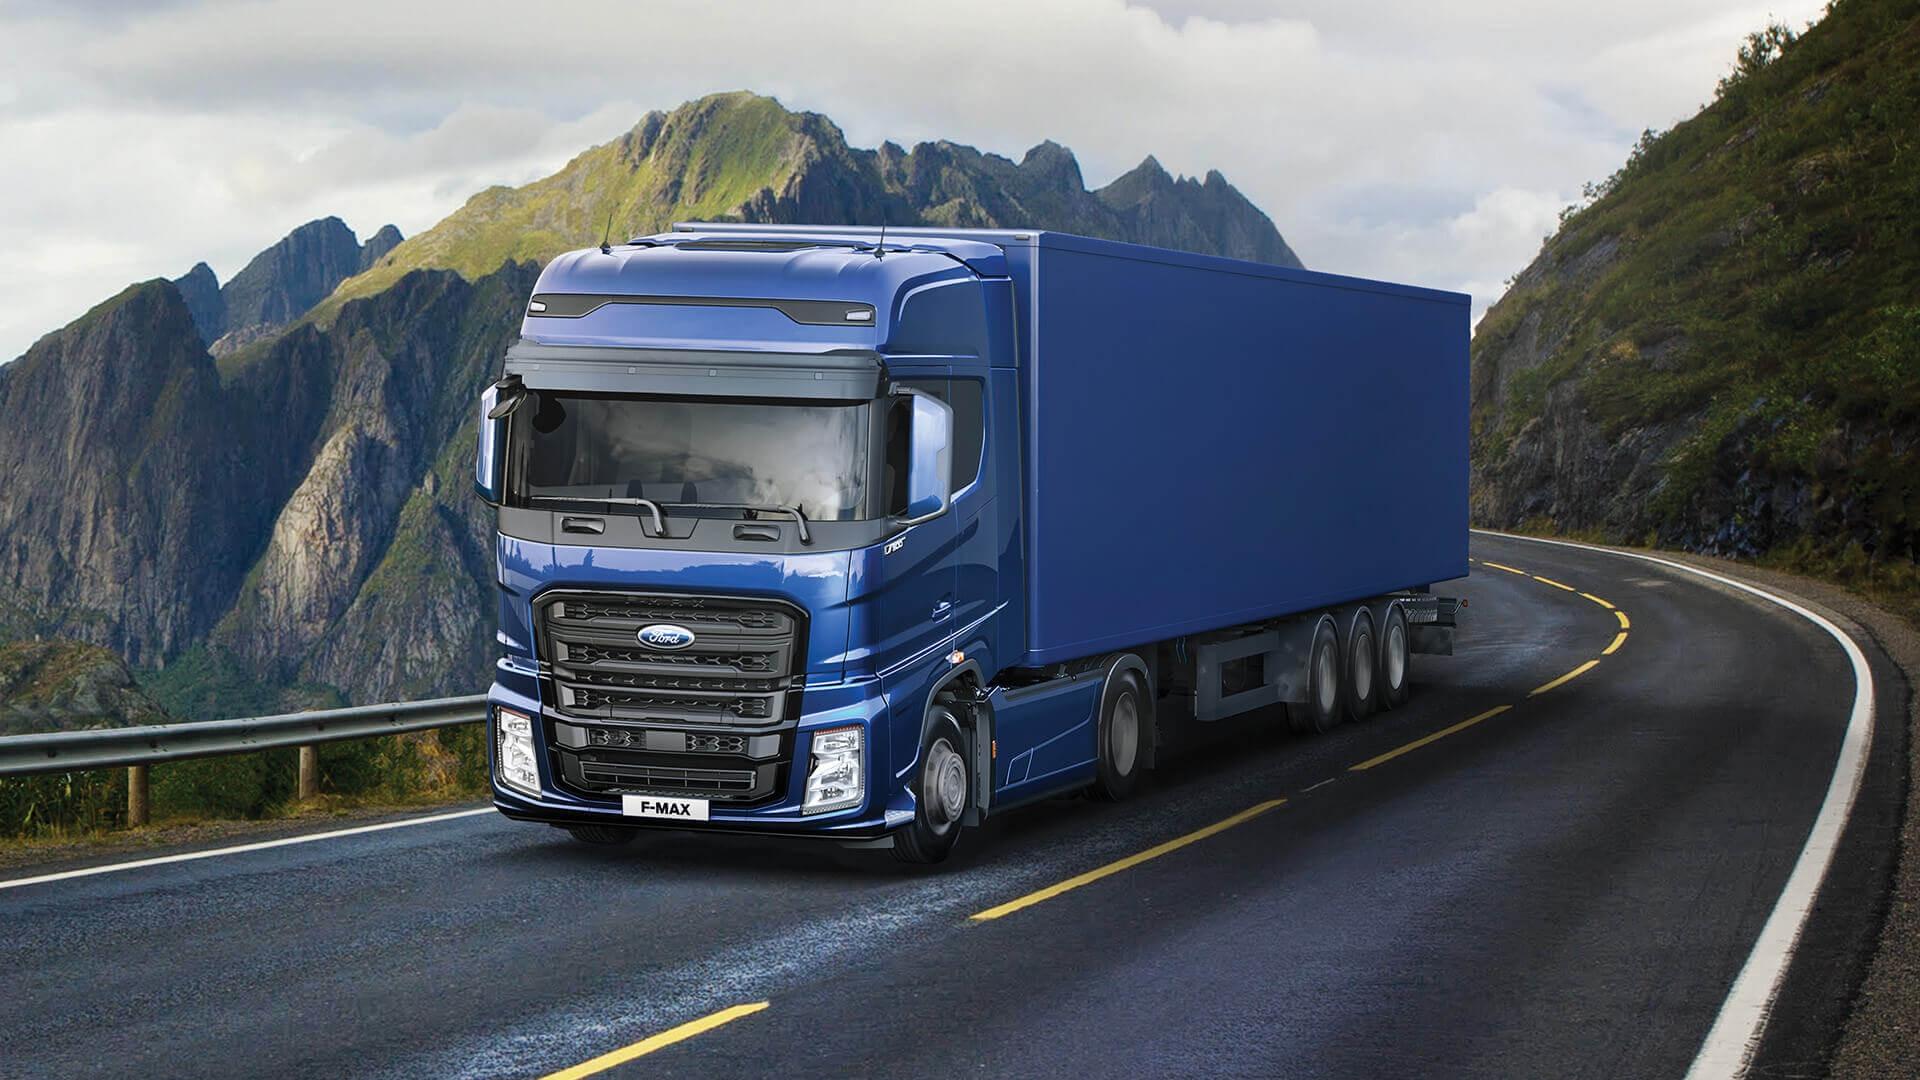 Camioane transport international f-max